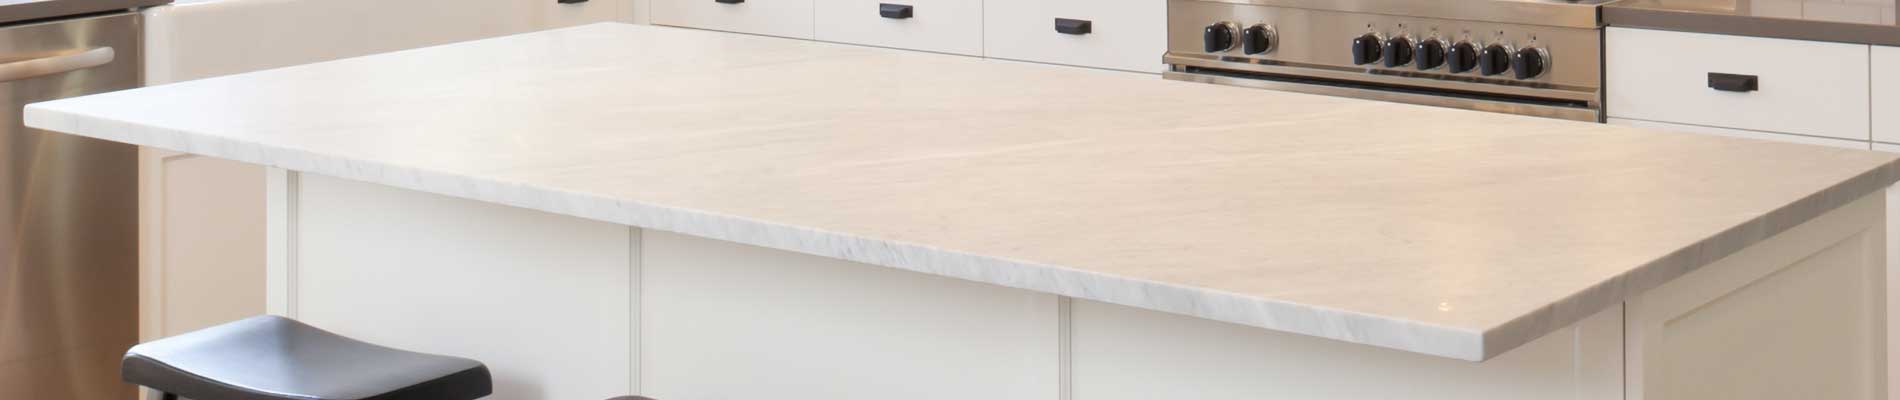 Granite Counter Support Brackets